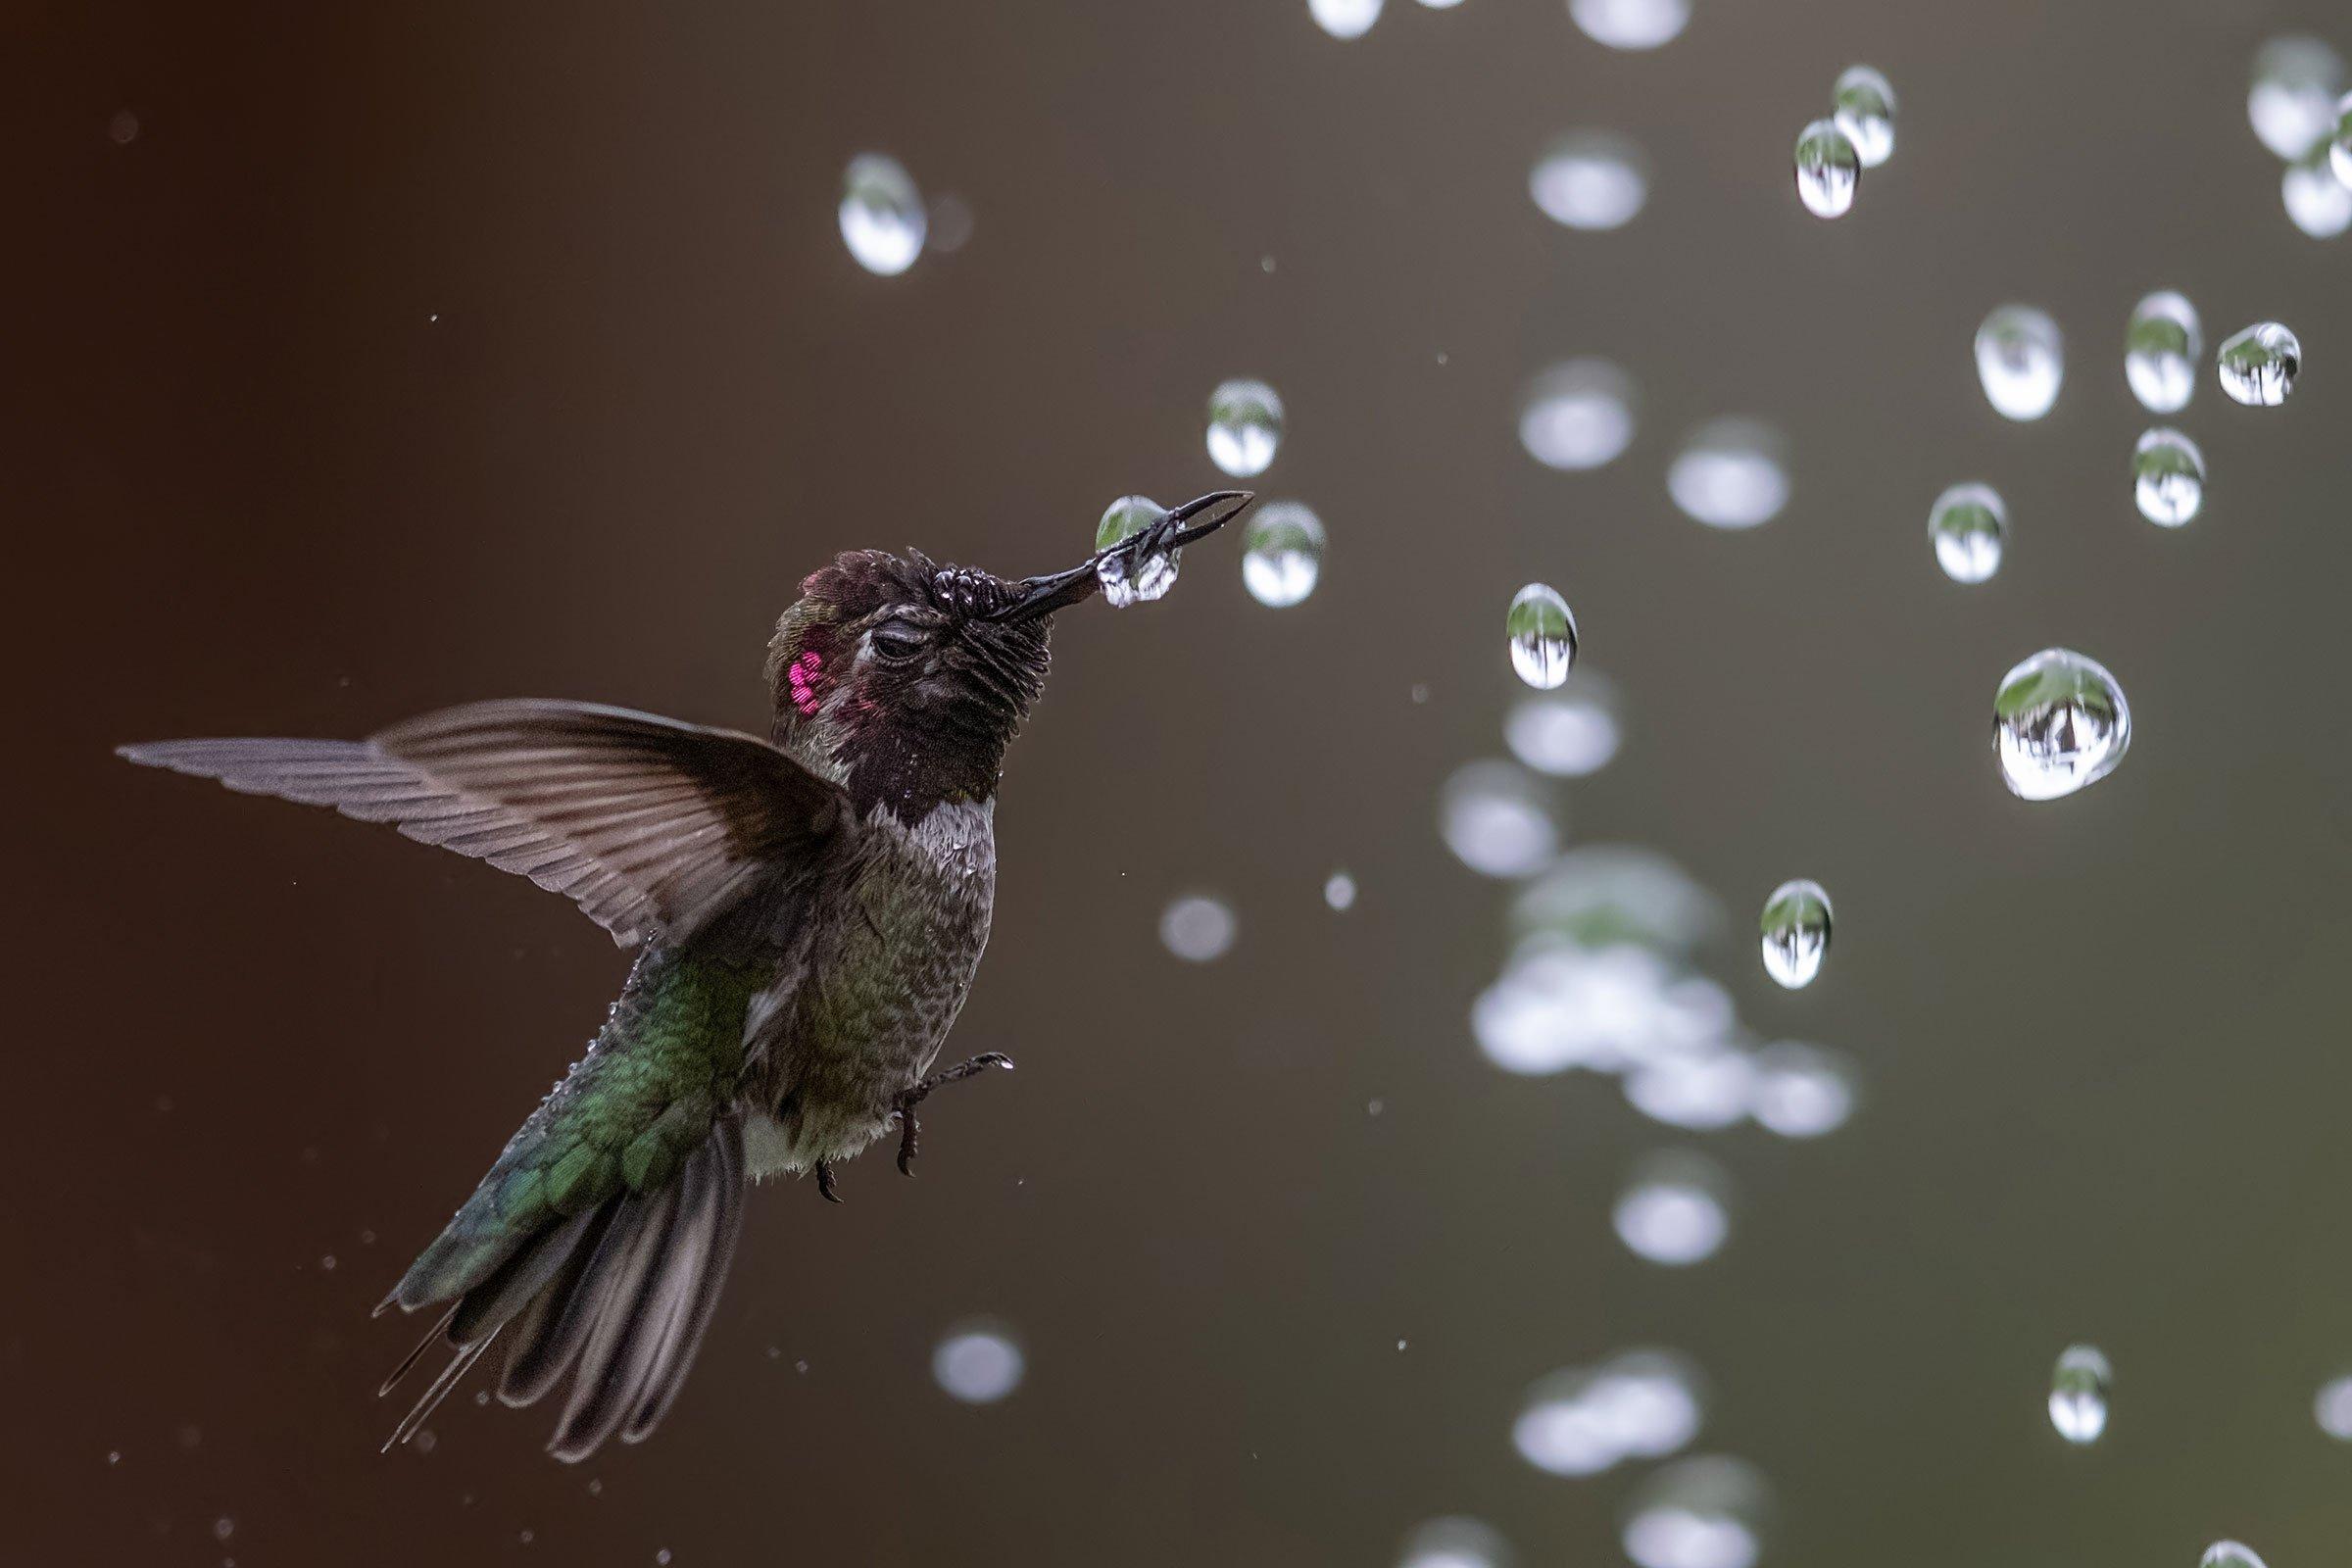 web_004_Amateur_02_Anna-s-Hummingbird_Bibek-Ghosh_annashummingbird_high_res